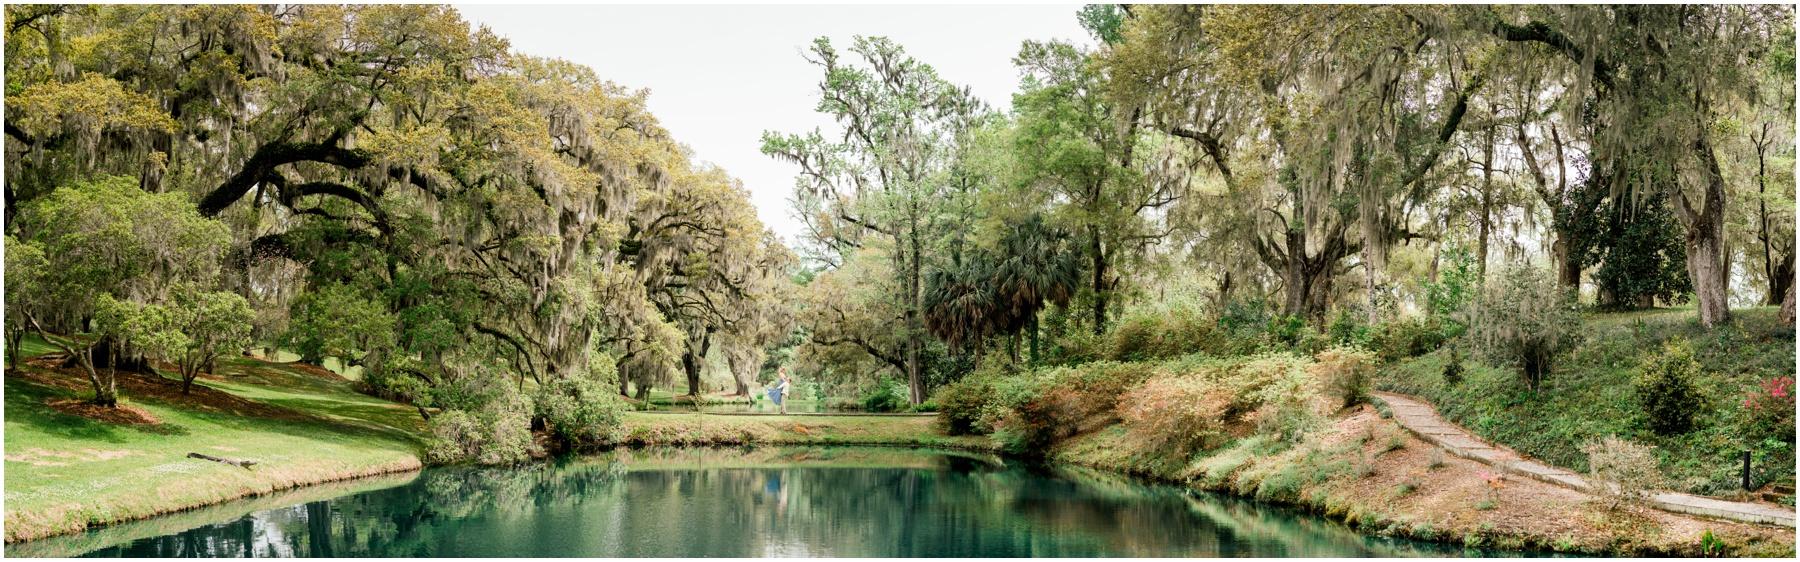 Mepkin-Abbey-Moncks-Corner-South-Carolina-Engagement-Session-Photos_0011.jpg